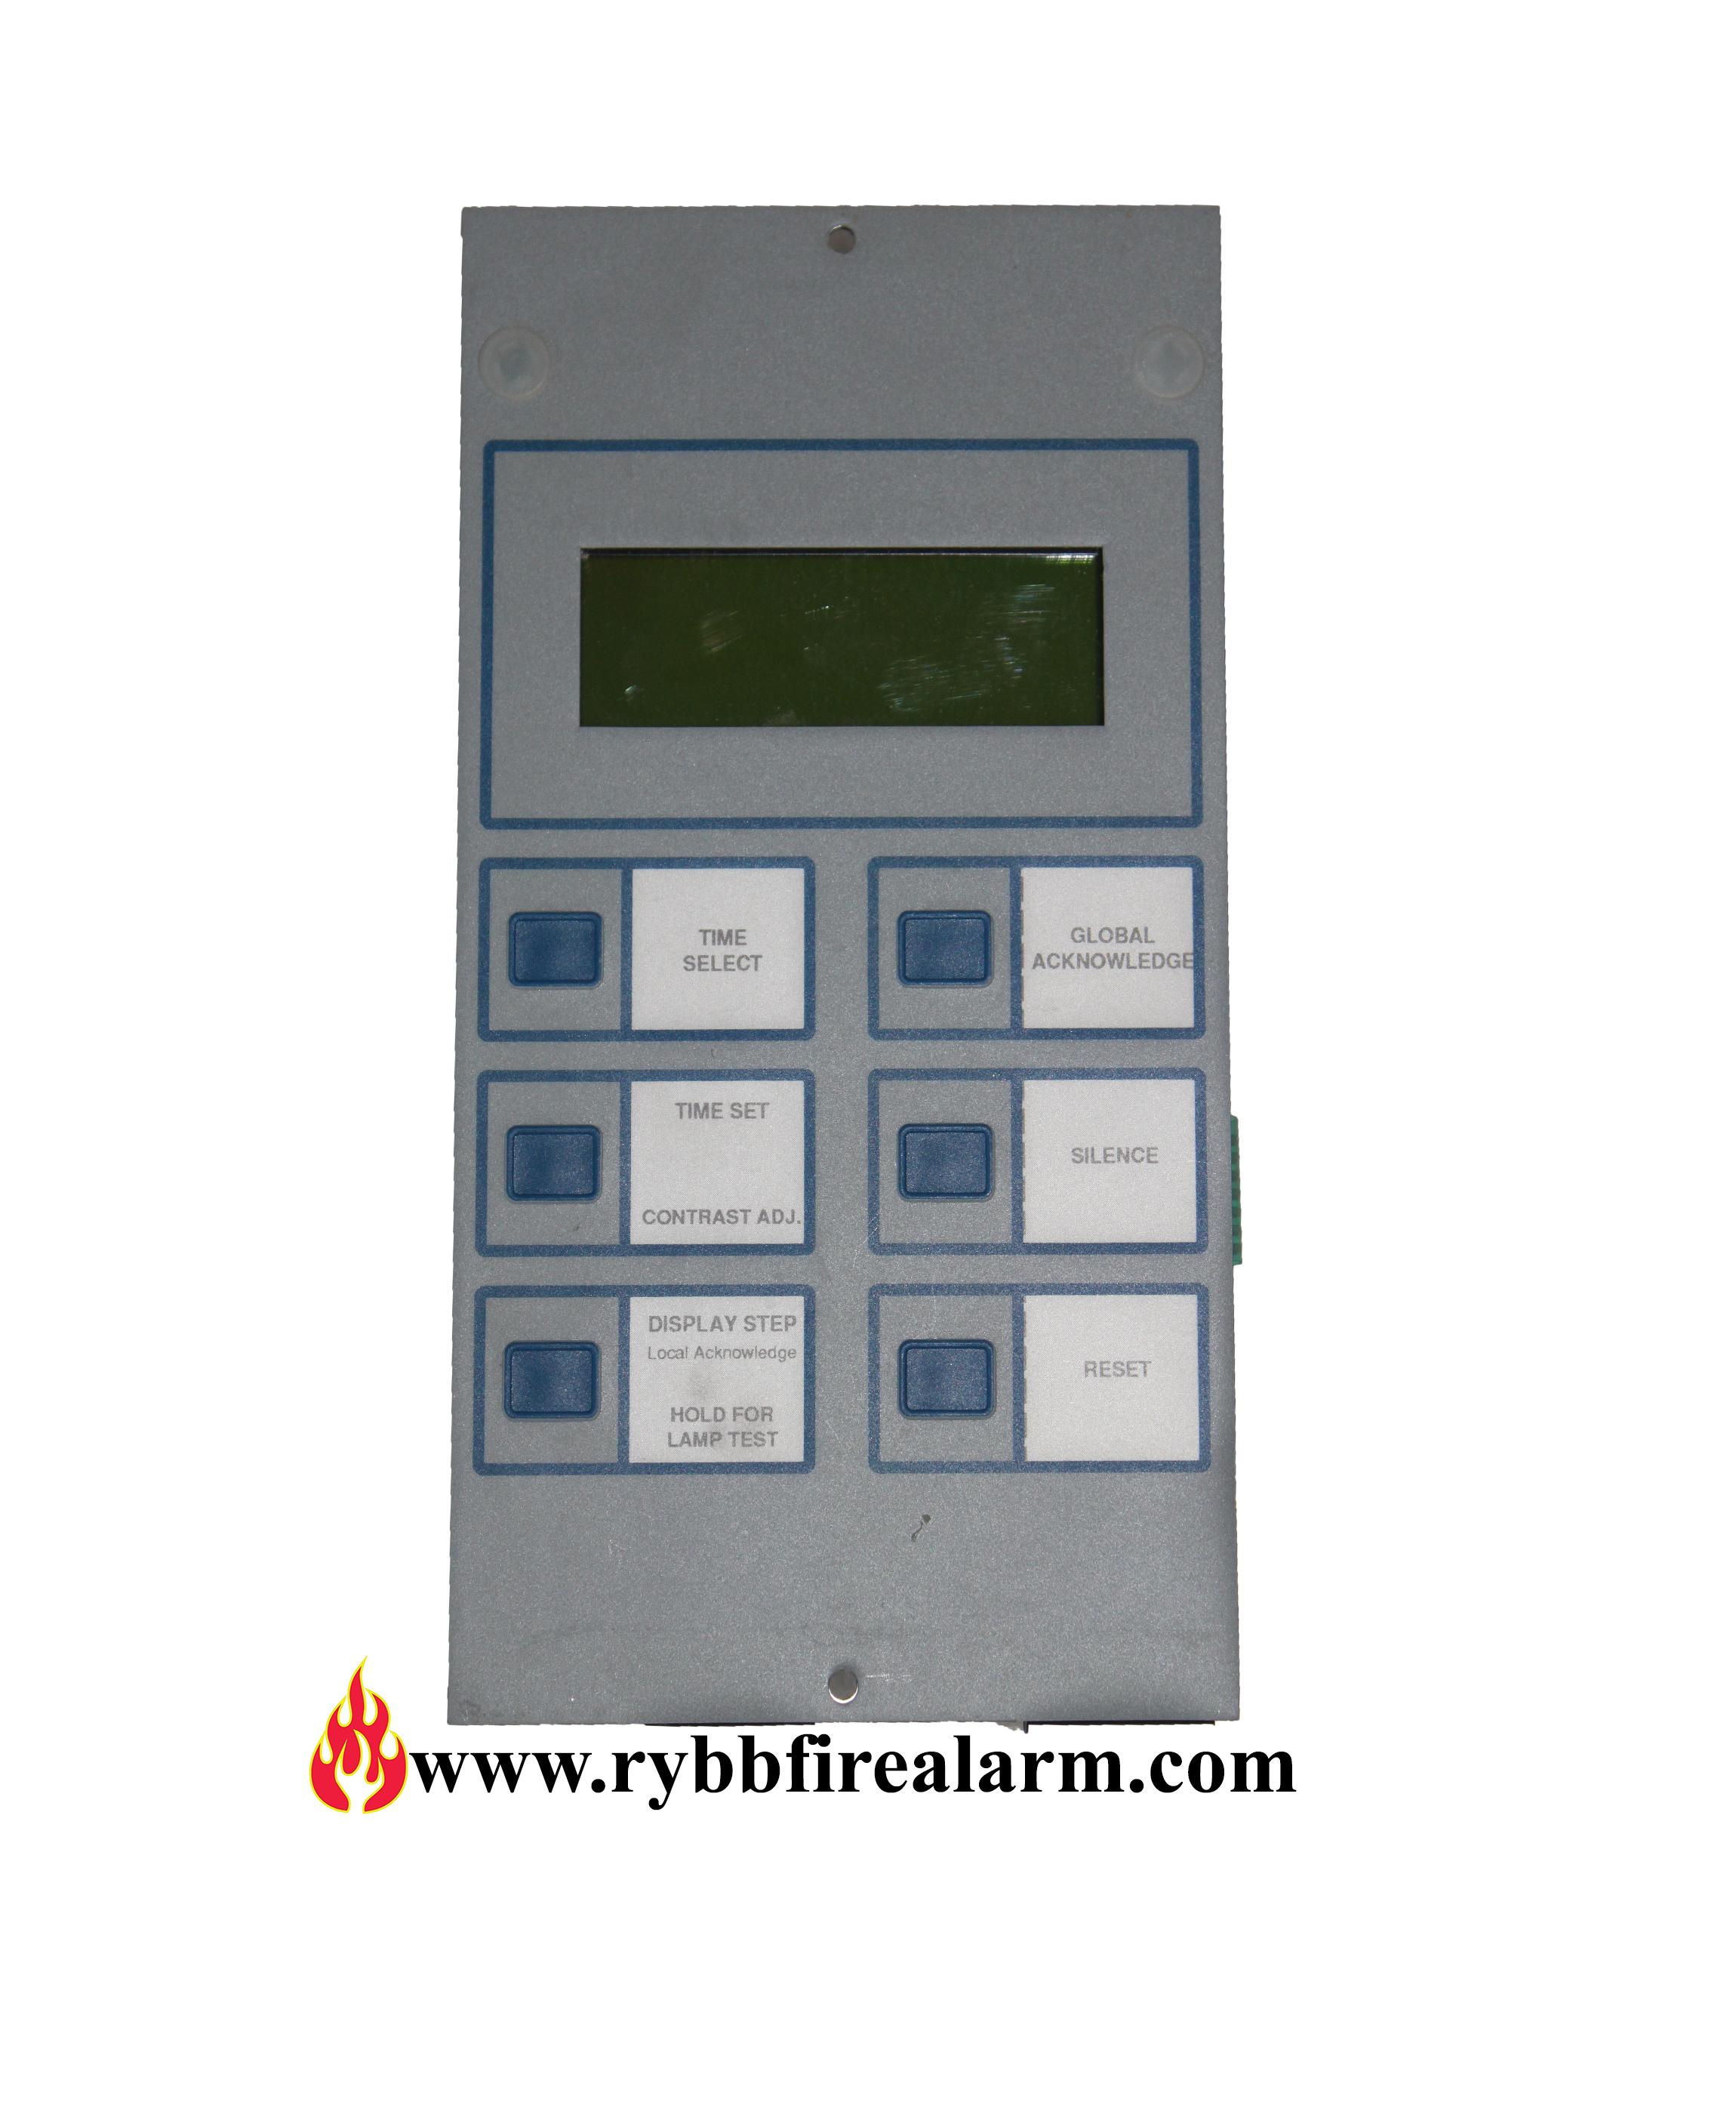 notifier lcd 80 fire alarm annunciator rybb fire alarm parts rh rybbfirealarm com Notifier System 5000 Operation Manual Honeywell Notifier User Manual